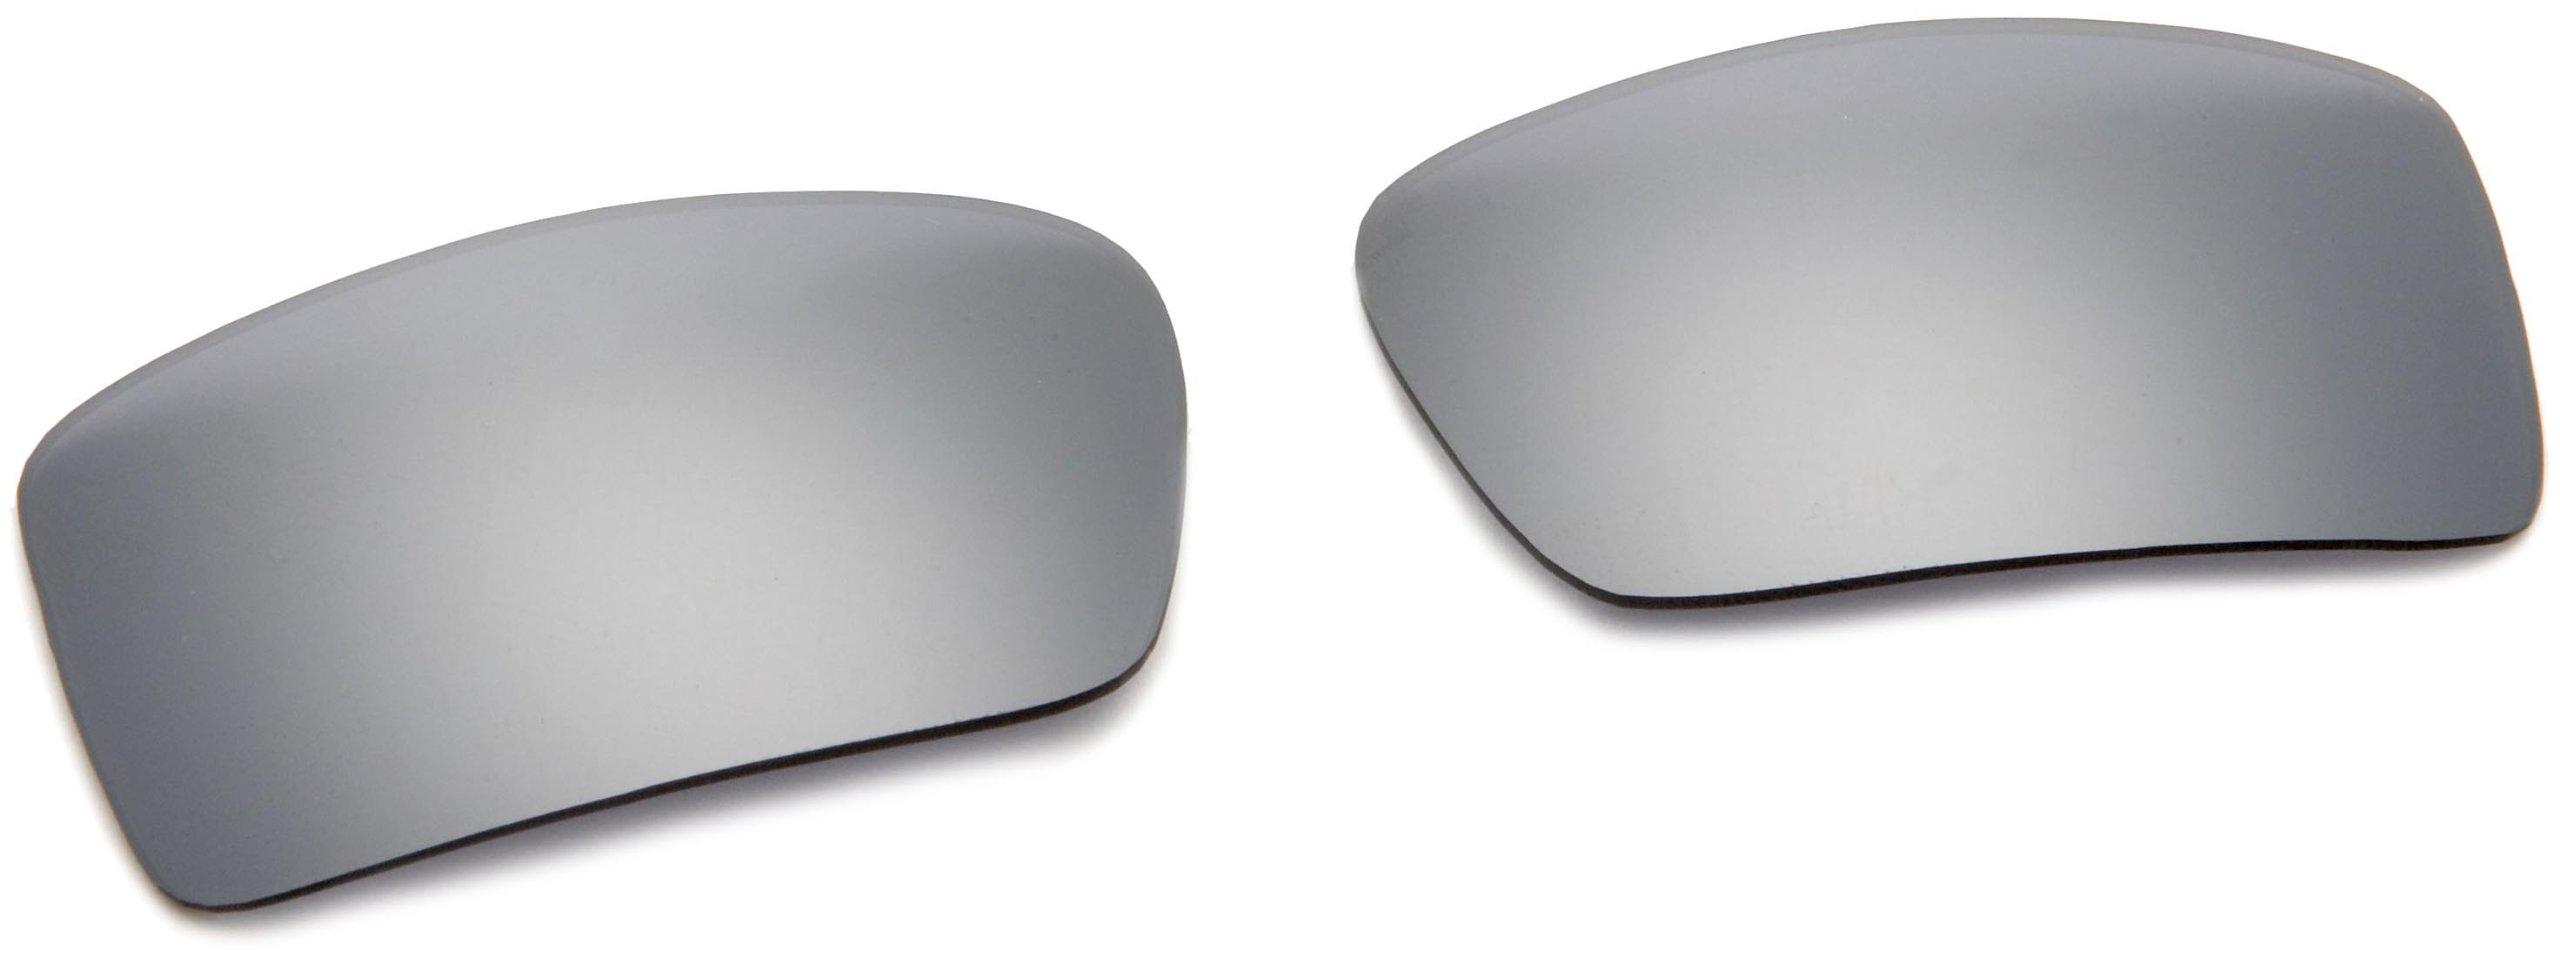 Oakley Men's Gascan Sunglasses Replacement Lenses, Black Iridium, 60 mm by Oakley